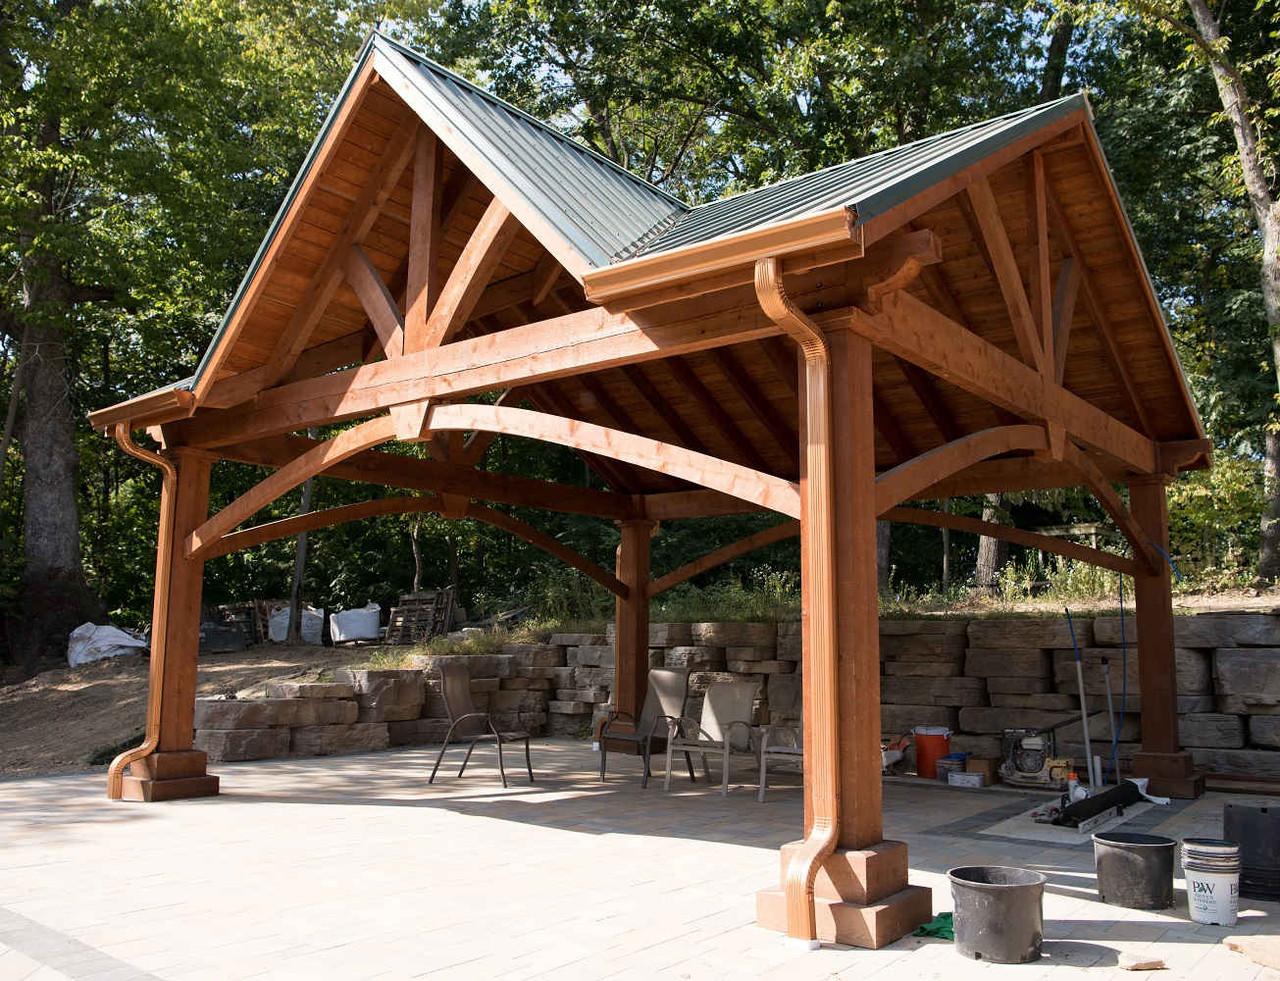 20x20 Grand Cedar Pavilion Kit with Third Gable, St. Charles, Missouri